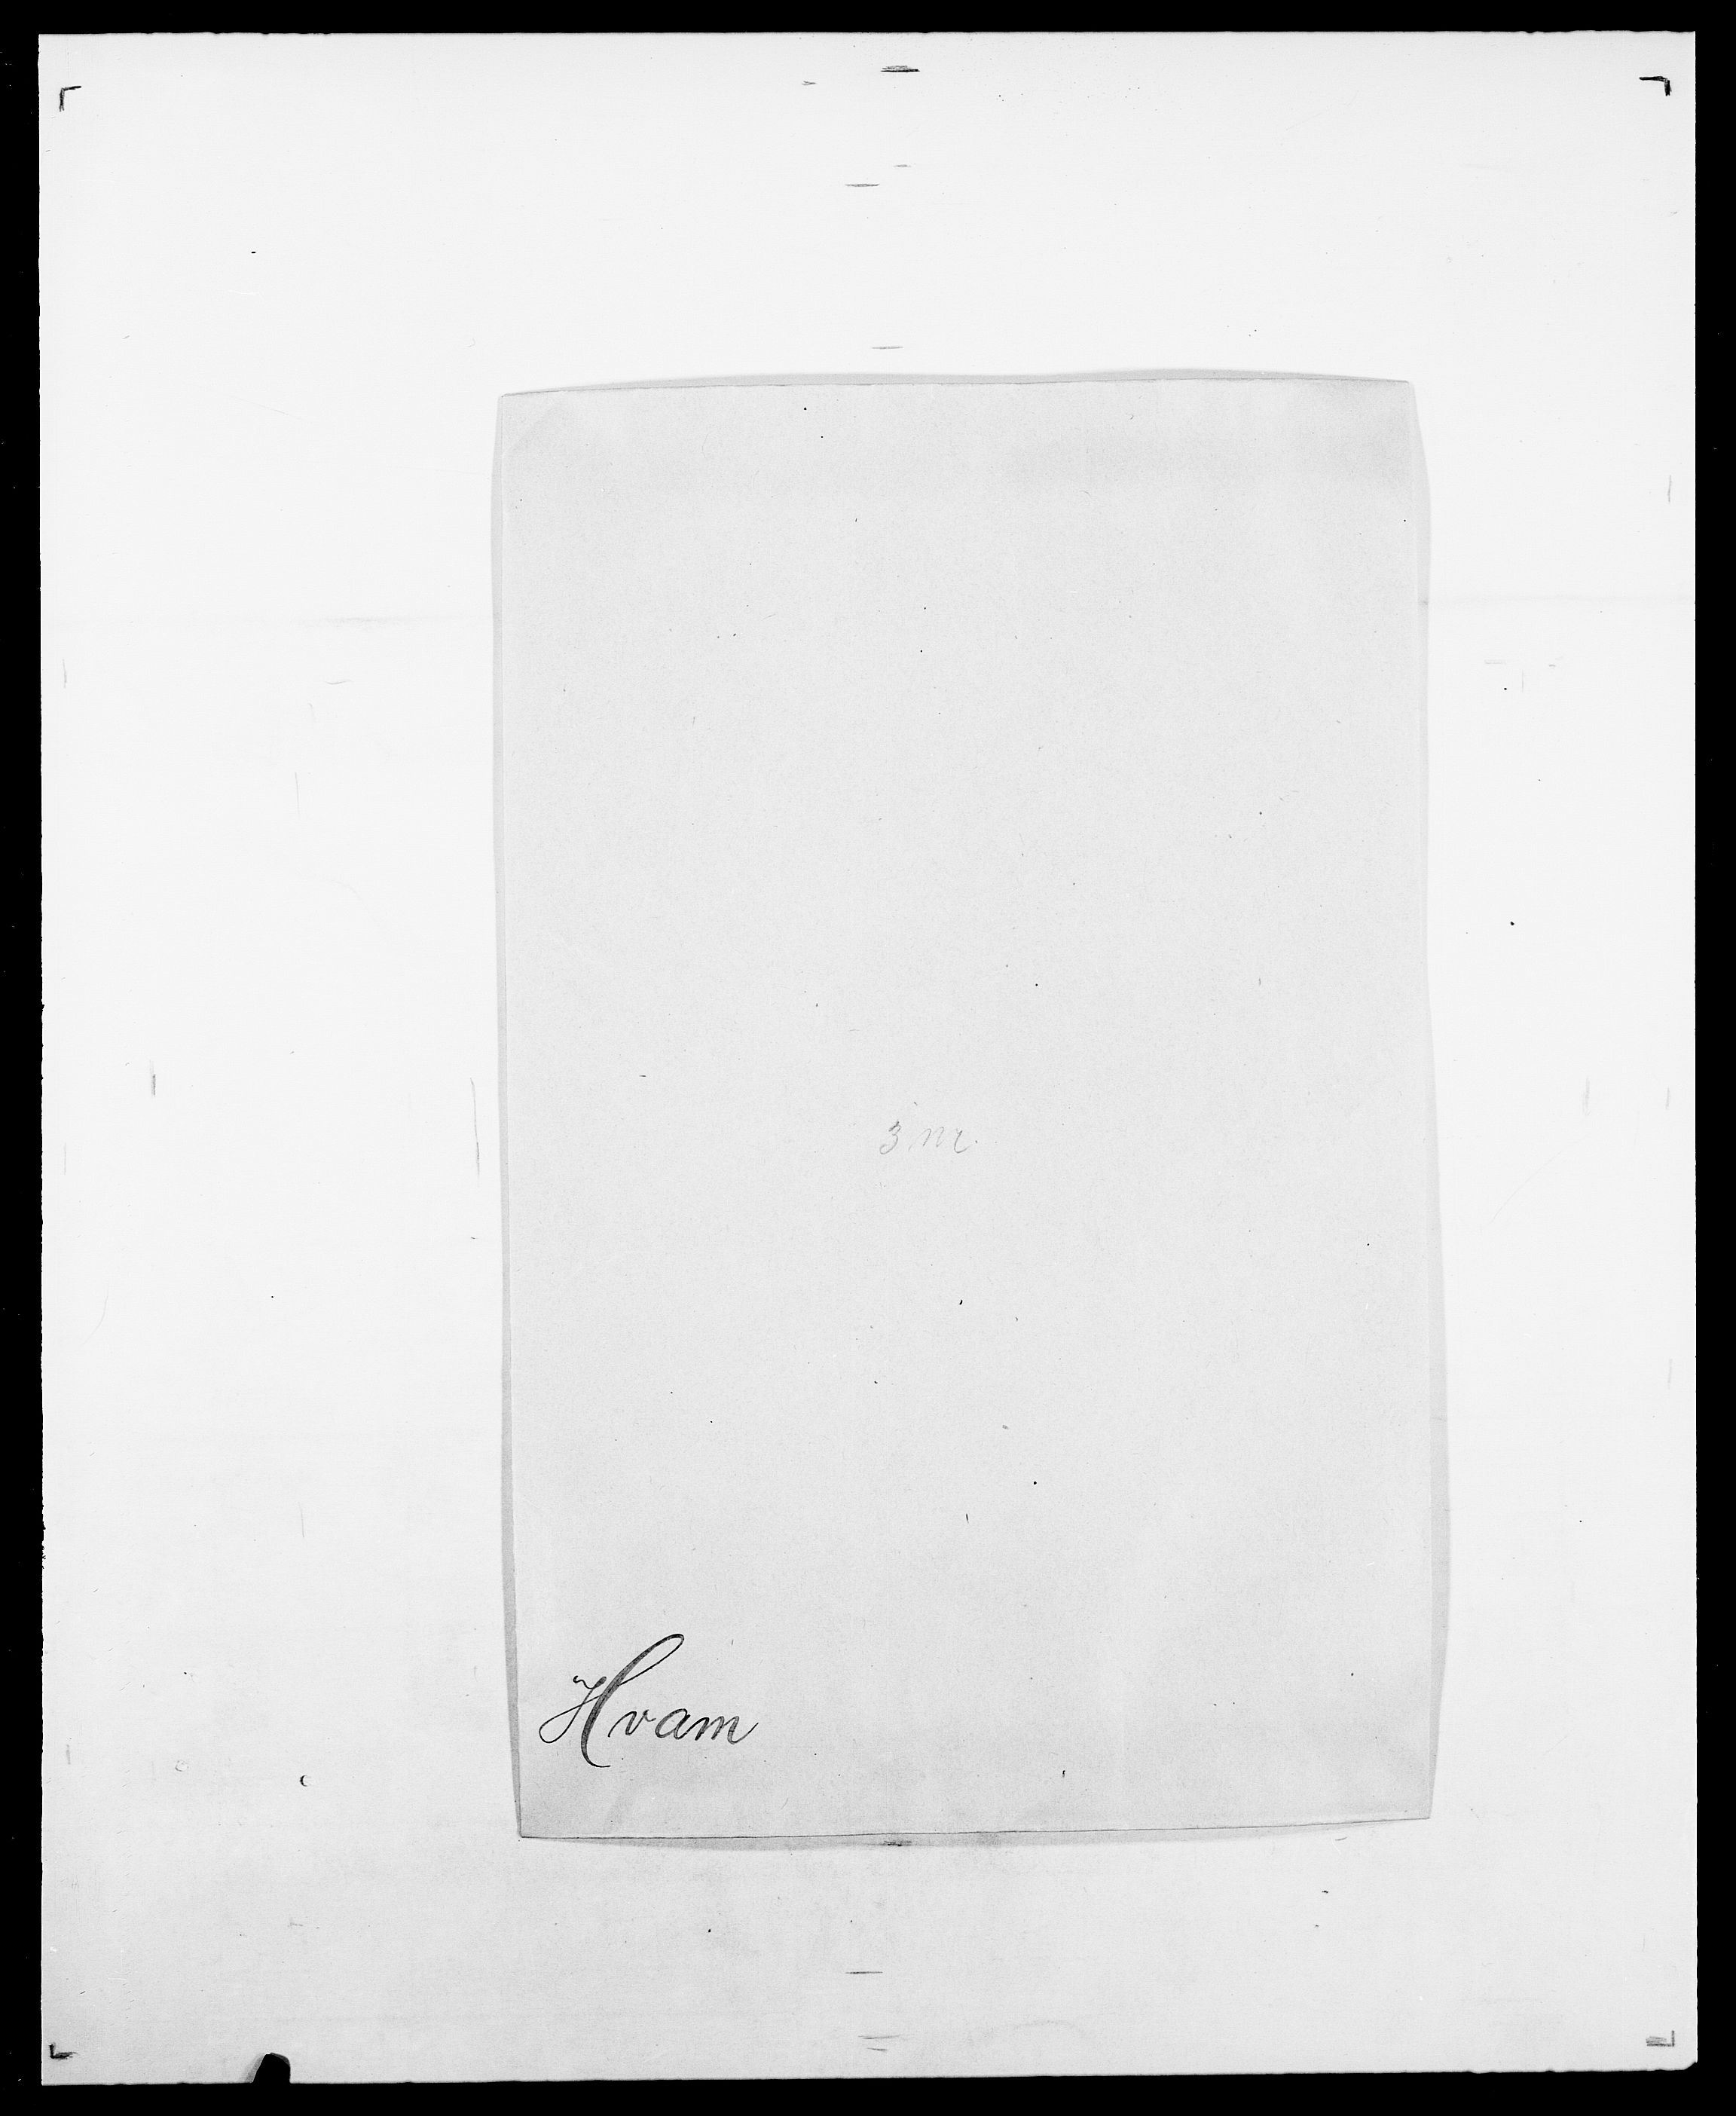 SAO, Delgobe, Charles Antoine - samling, D/Da/L0019: van der Hude - Joys, s. 118